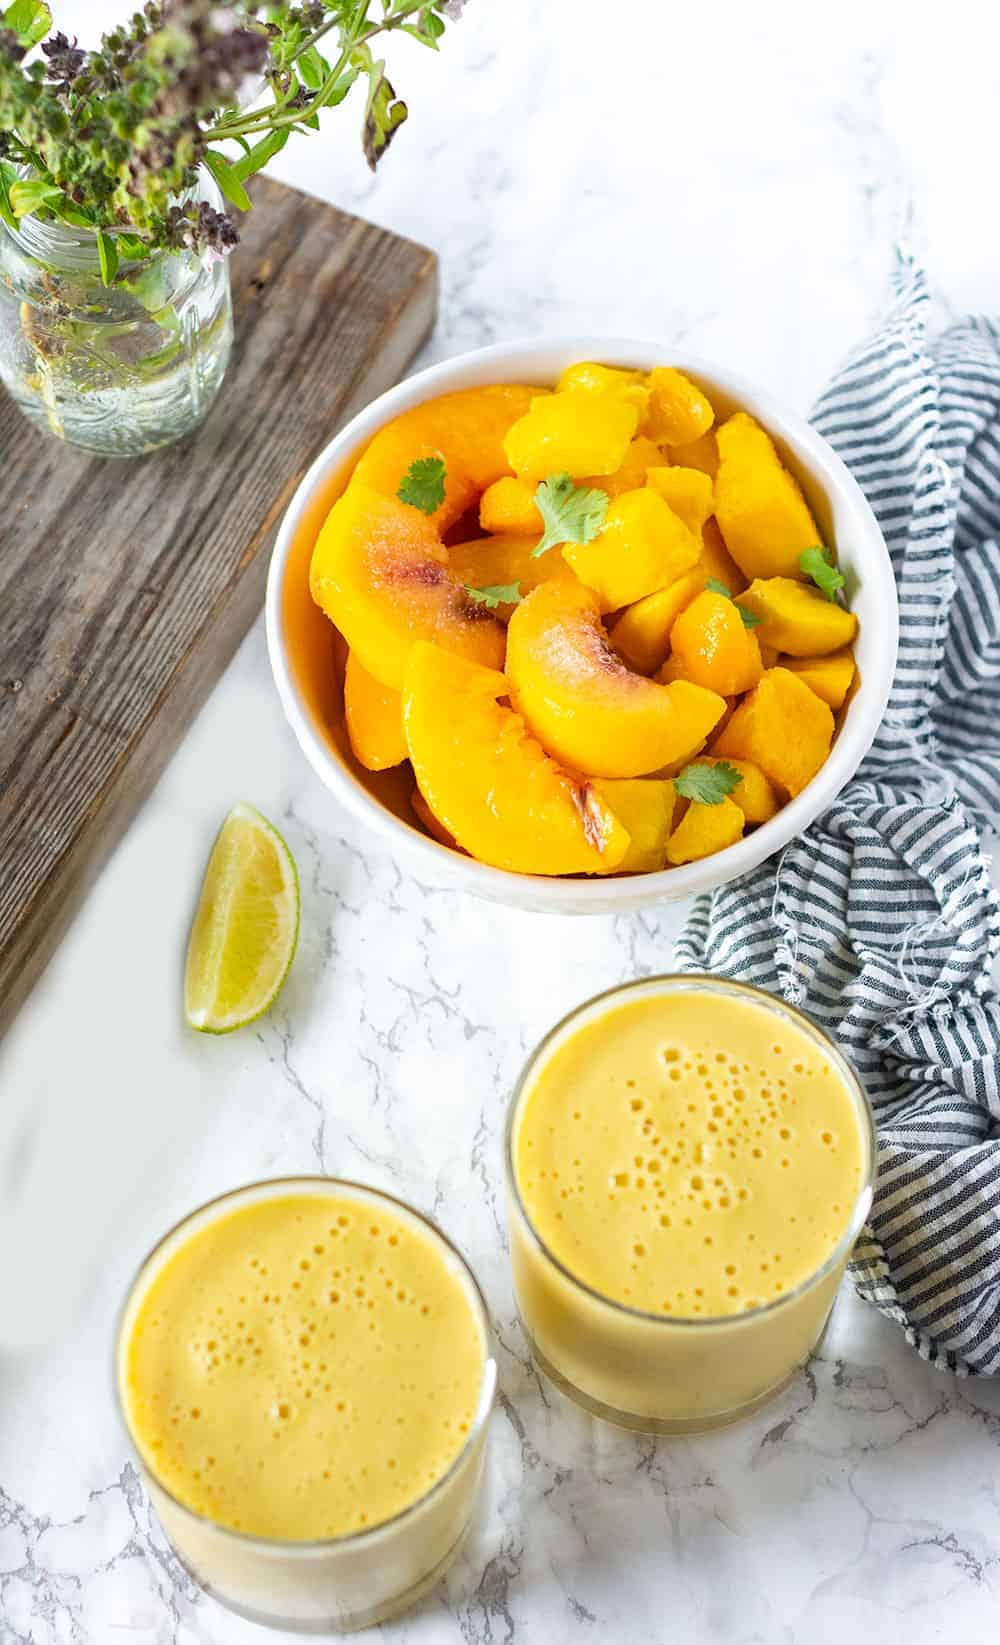 Peach Mango Smoothie overlay with mango peach fruits in a bowl